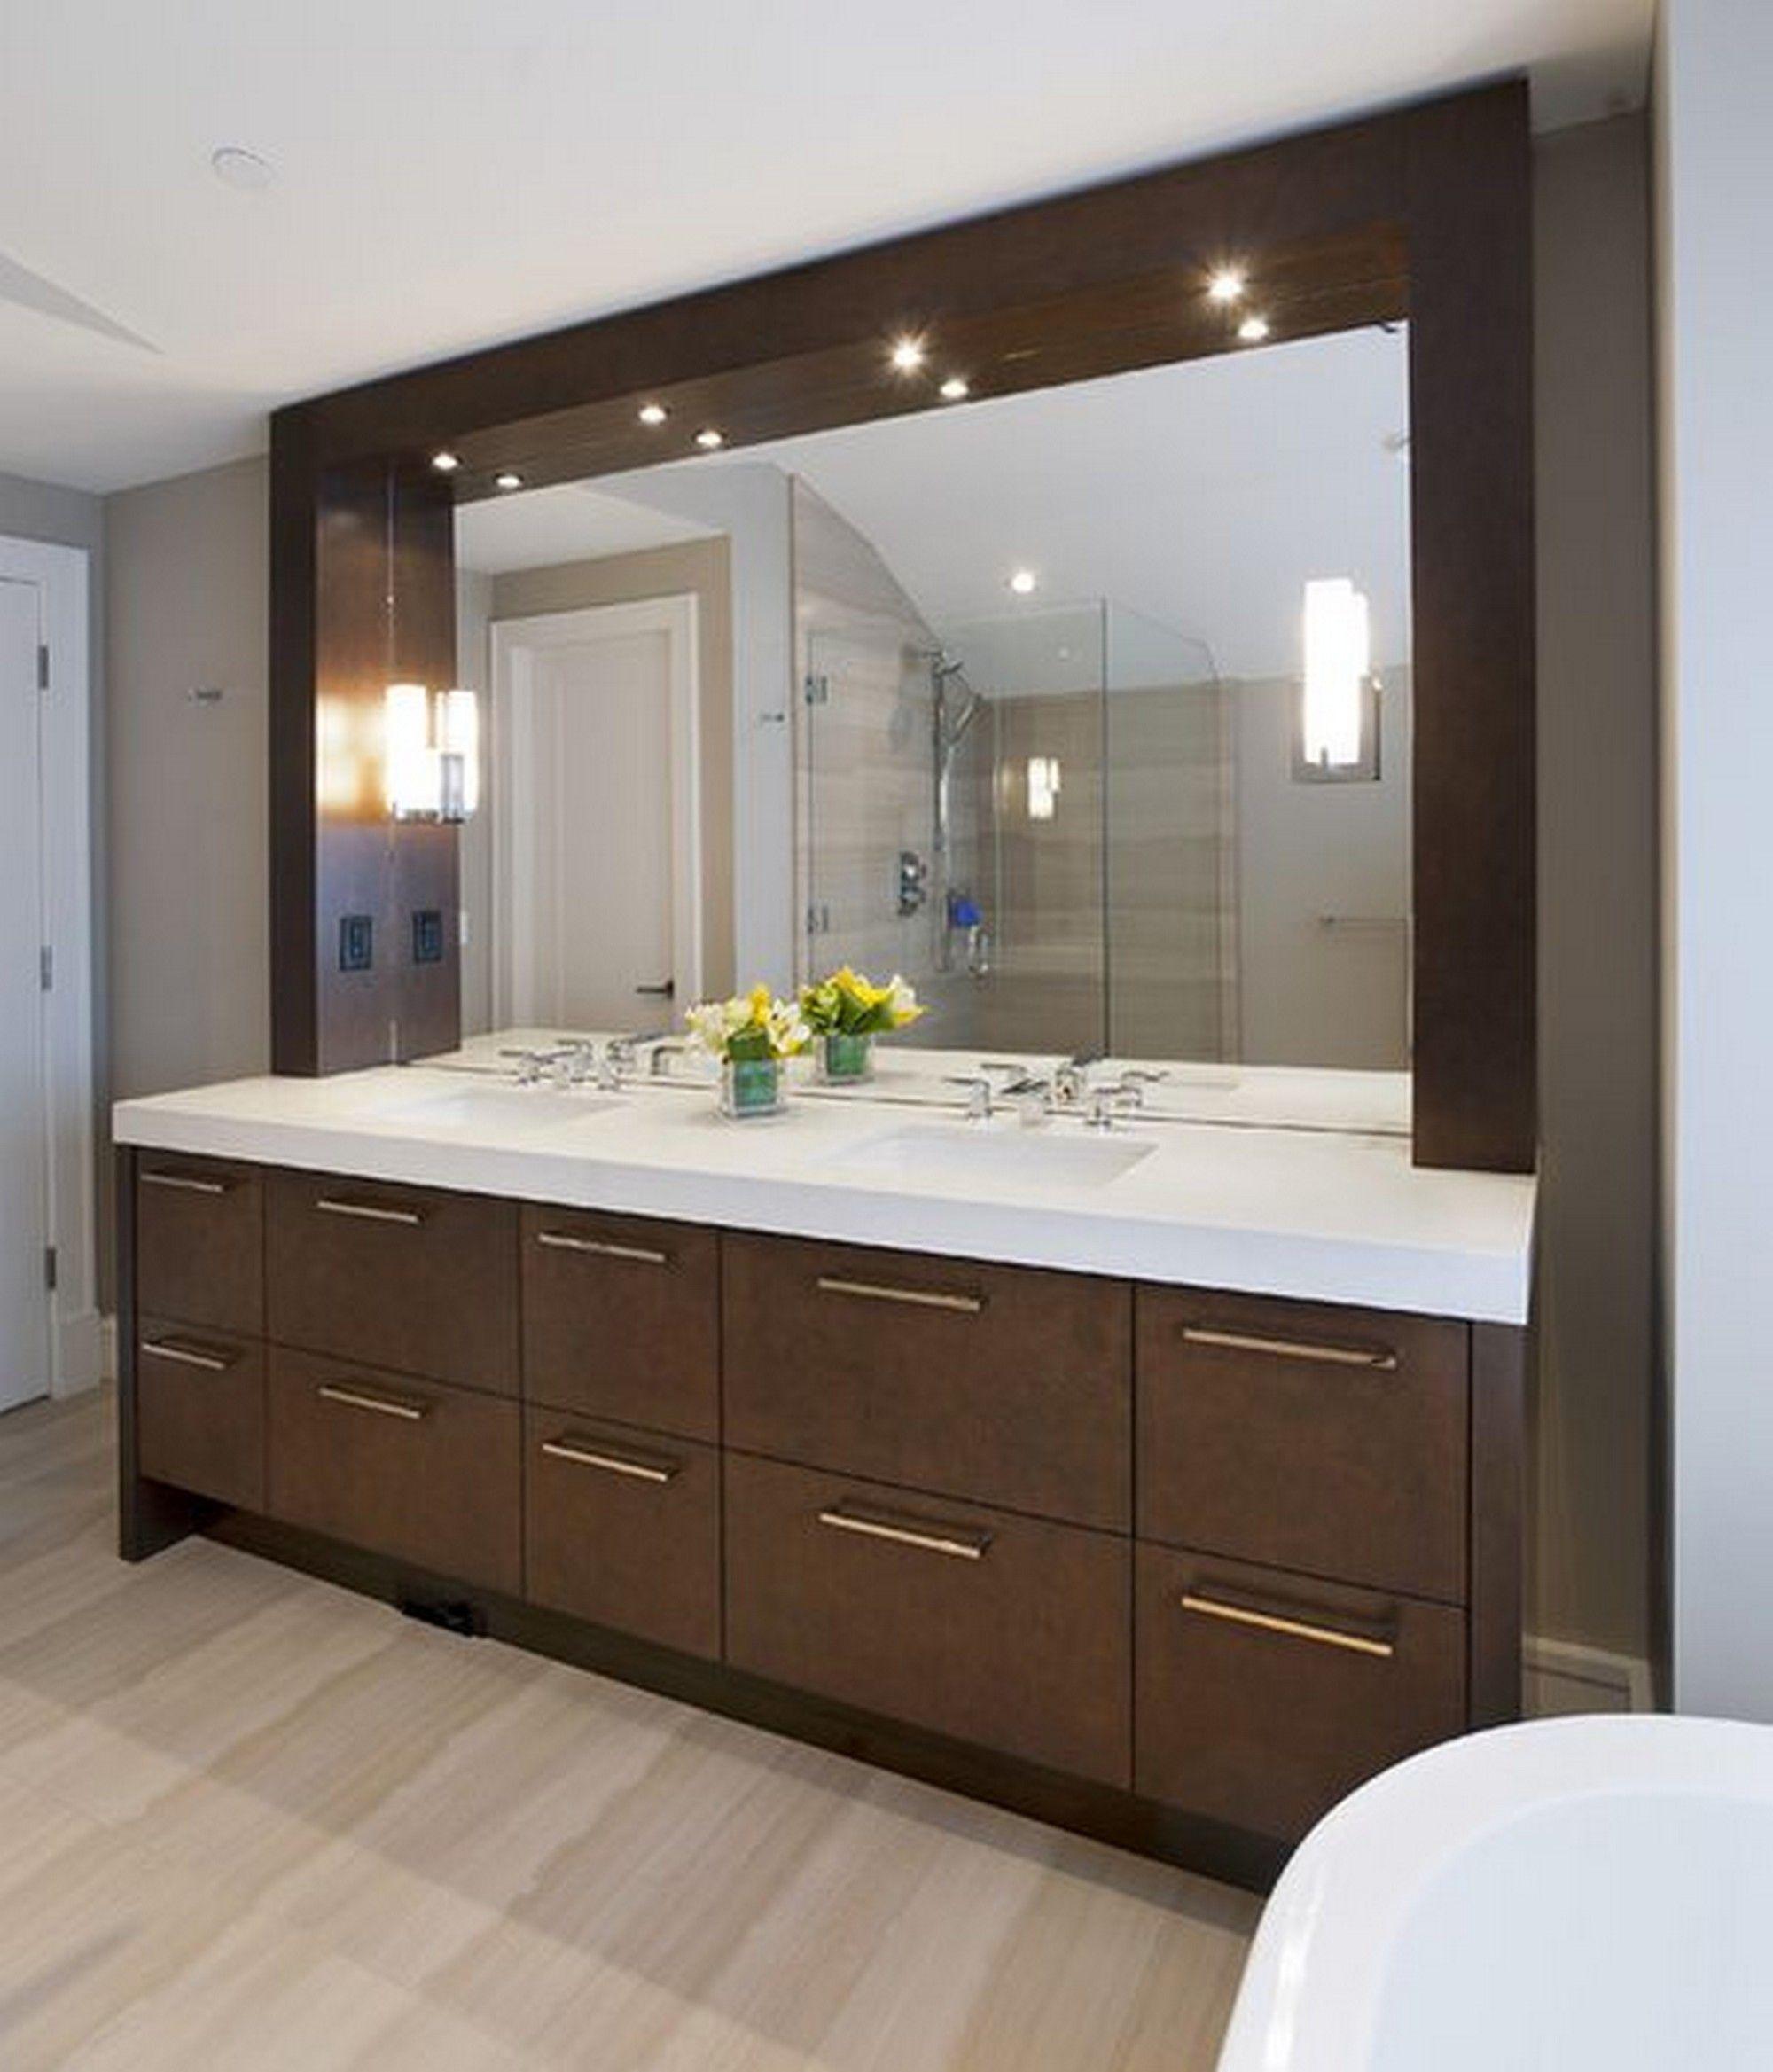 23 Fancy Framed Bathroom Mirrors Modern Bathroom Vanity